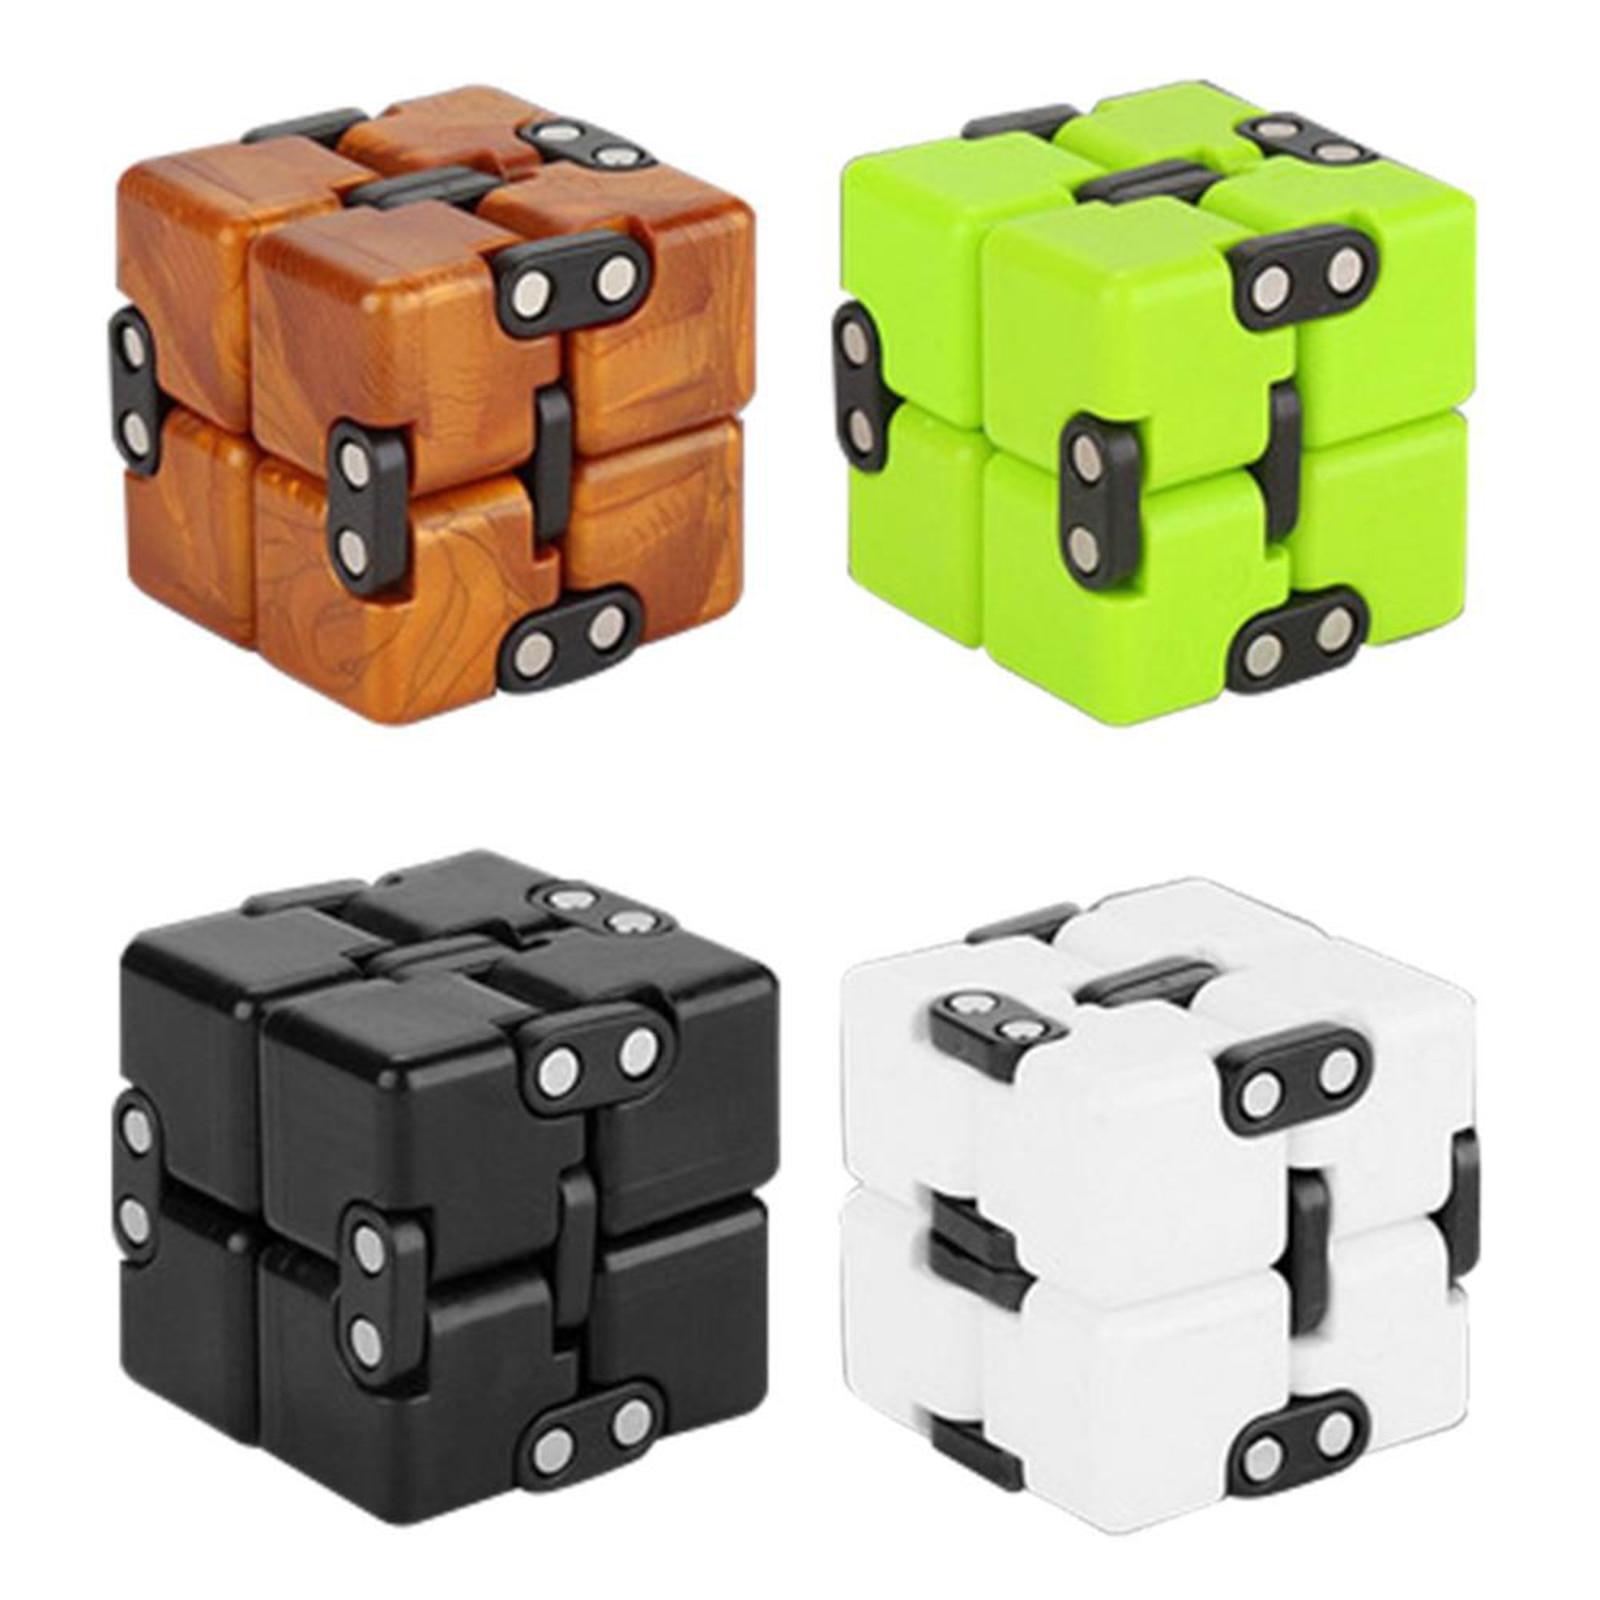 infinity cube magic square fidget toy 5432 - Wacky Track